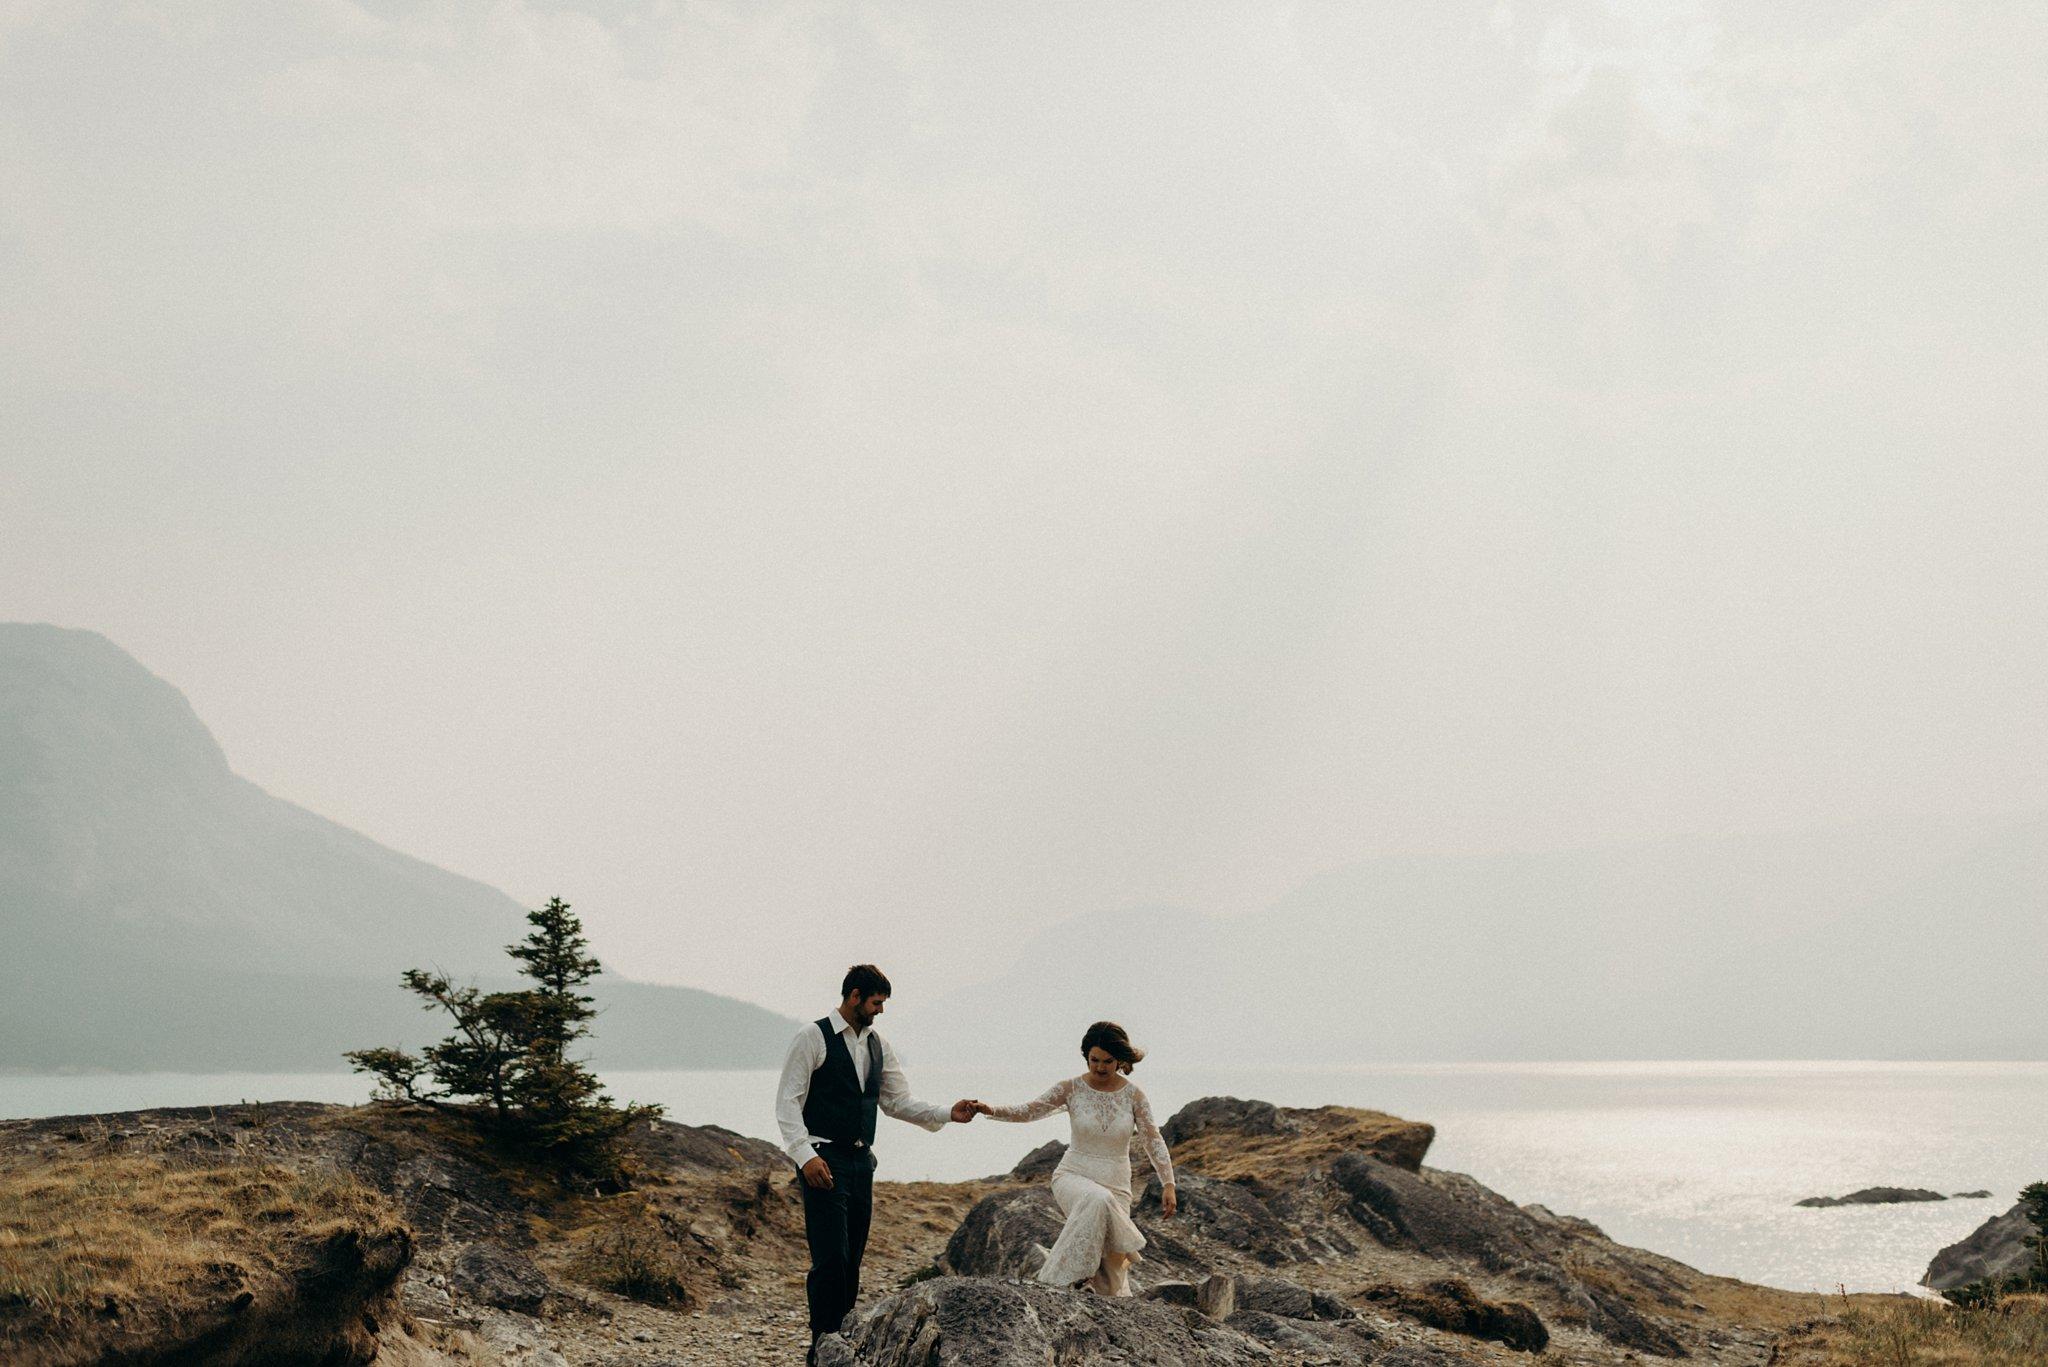 kaihla_tonai_intimate_wedding_elopement_photographer_6744.jpg